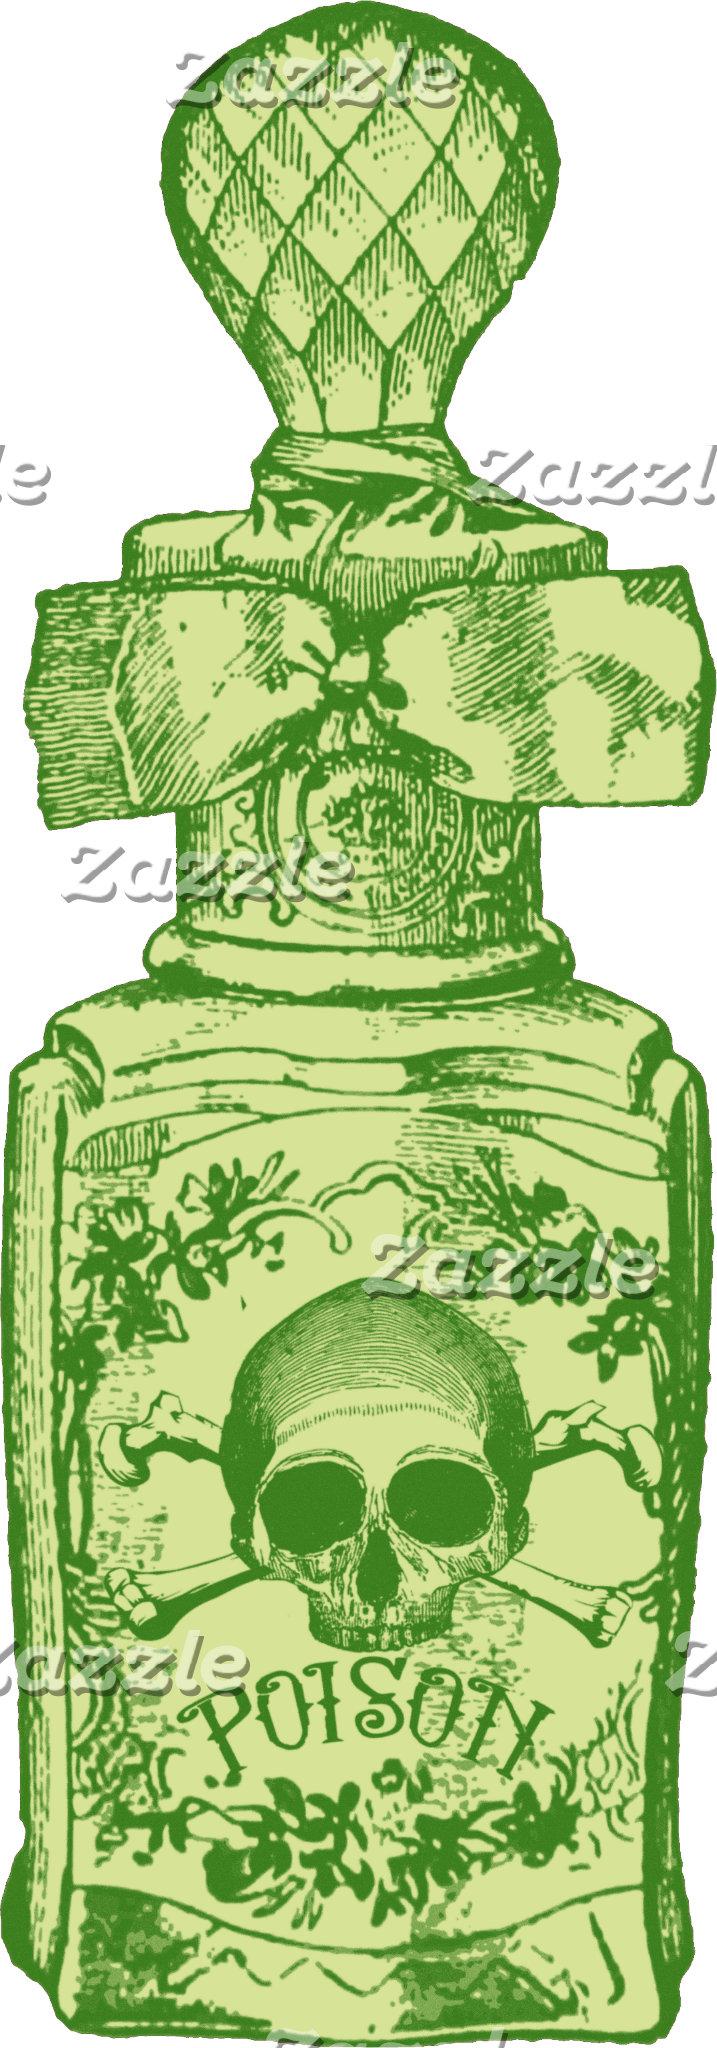 Pretty Green Poison Bottle